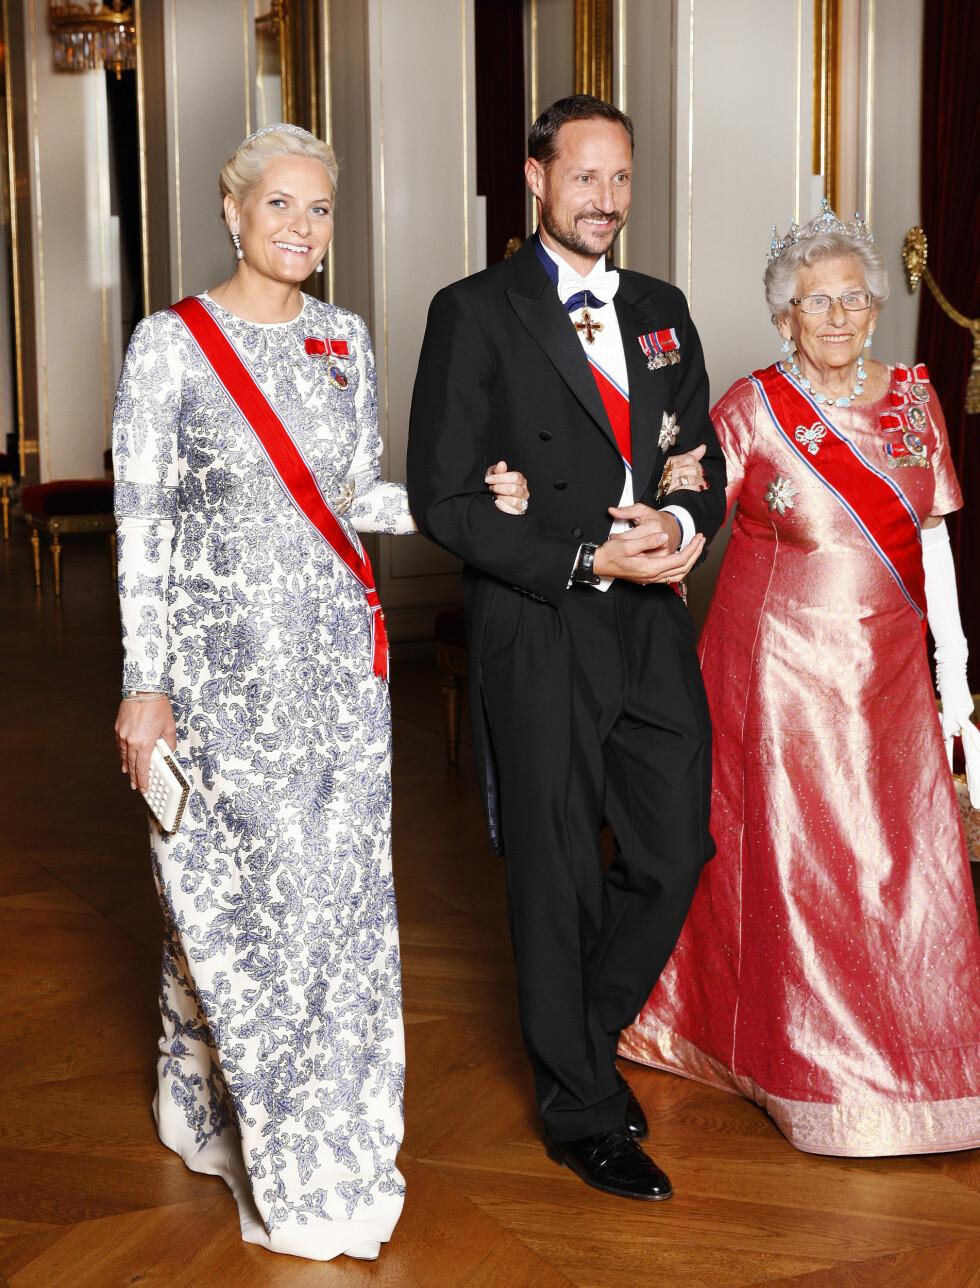 2014: Prinsesse Astrid sammen med kronprins Haakon og kronprinsesse Mette-Marit under stortingsmiddagen i fjor.